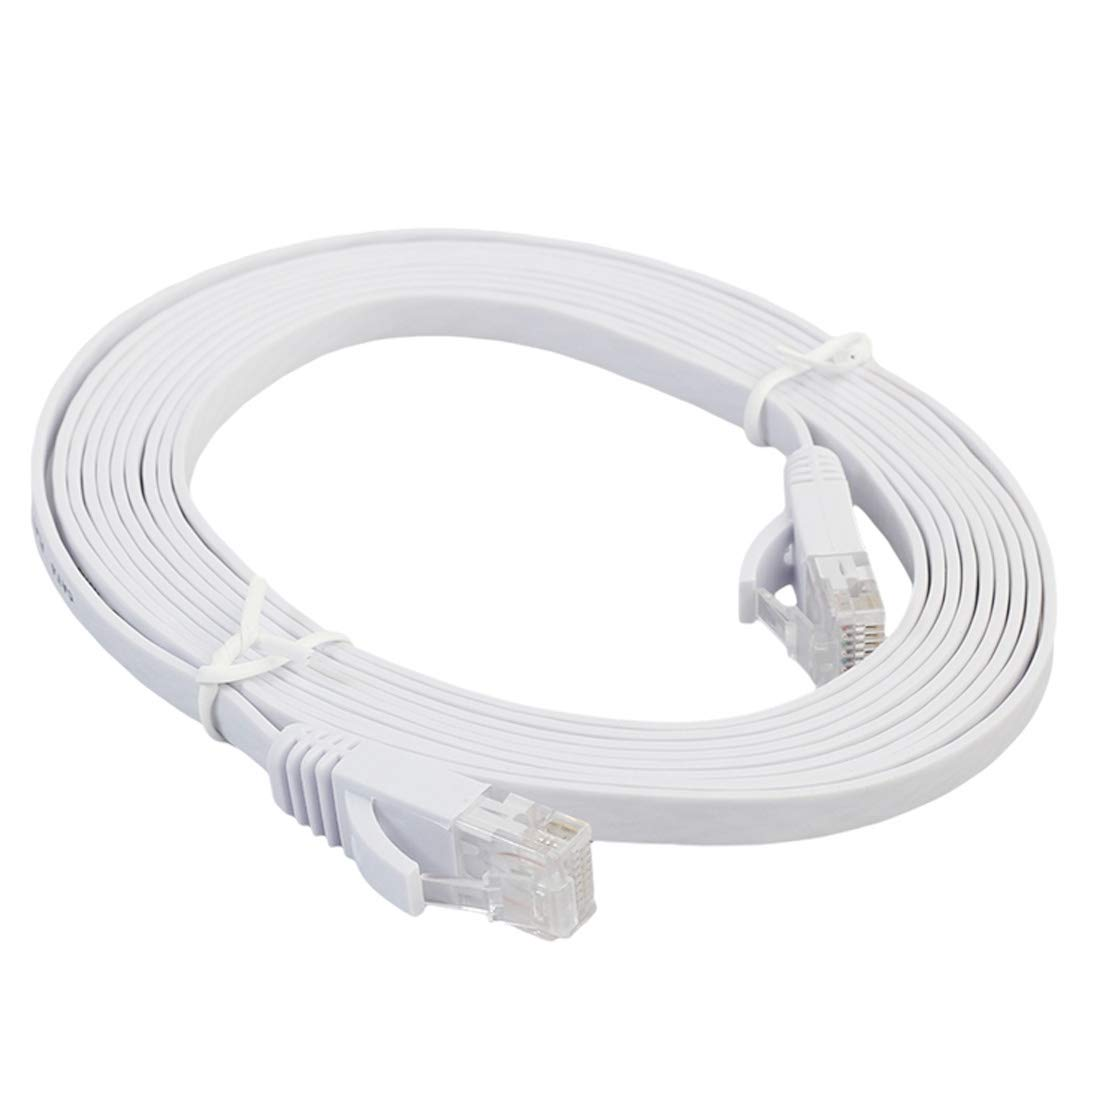 Orange Color : White Patch Lead RJ45 JINYANG 2m CAT6 Ultra-Thin Flat Ethernet Network LAN Cable